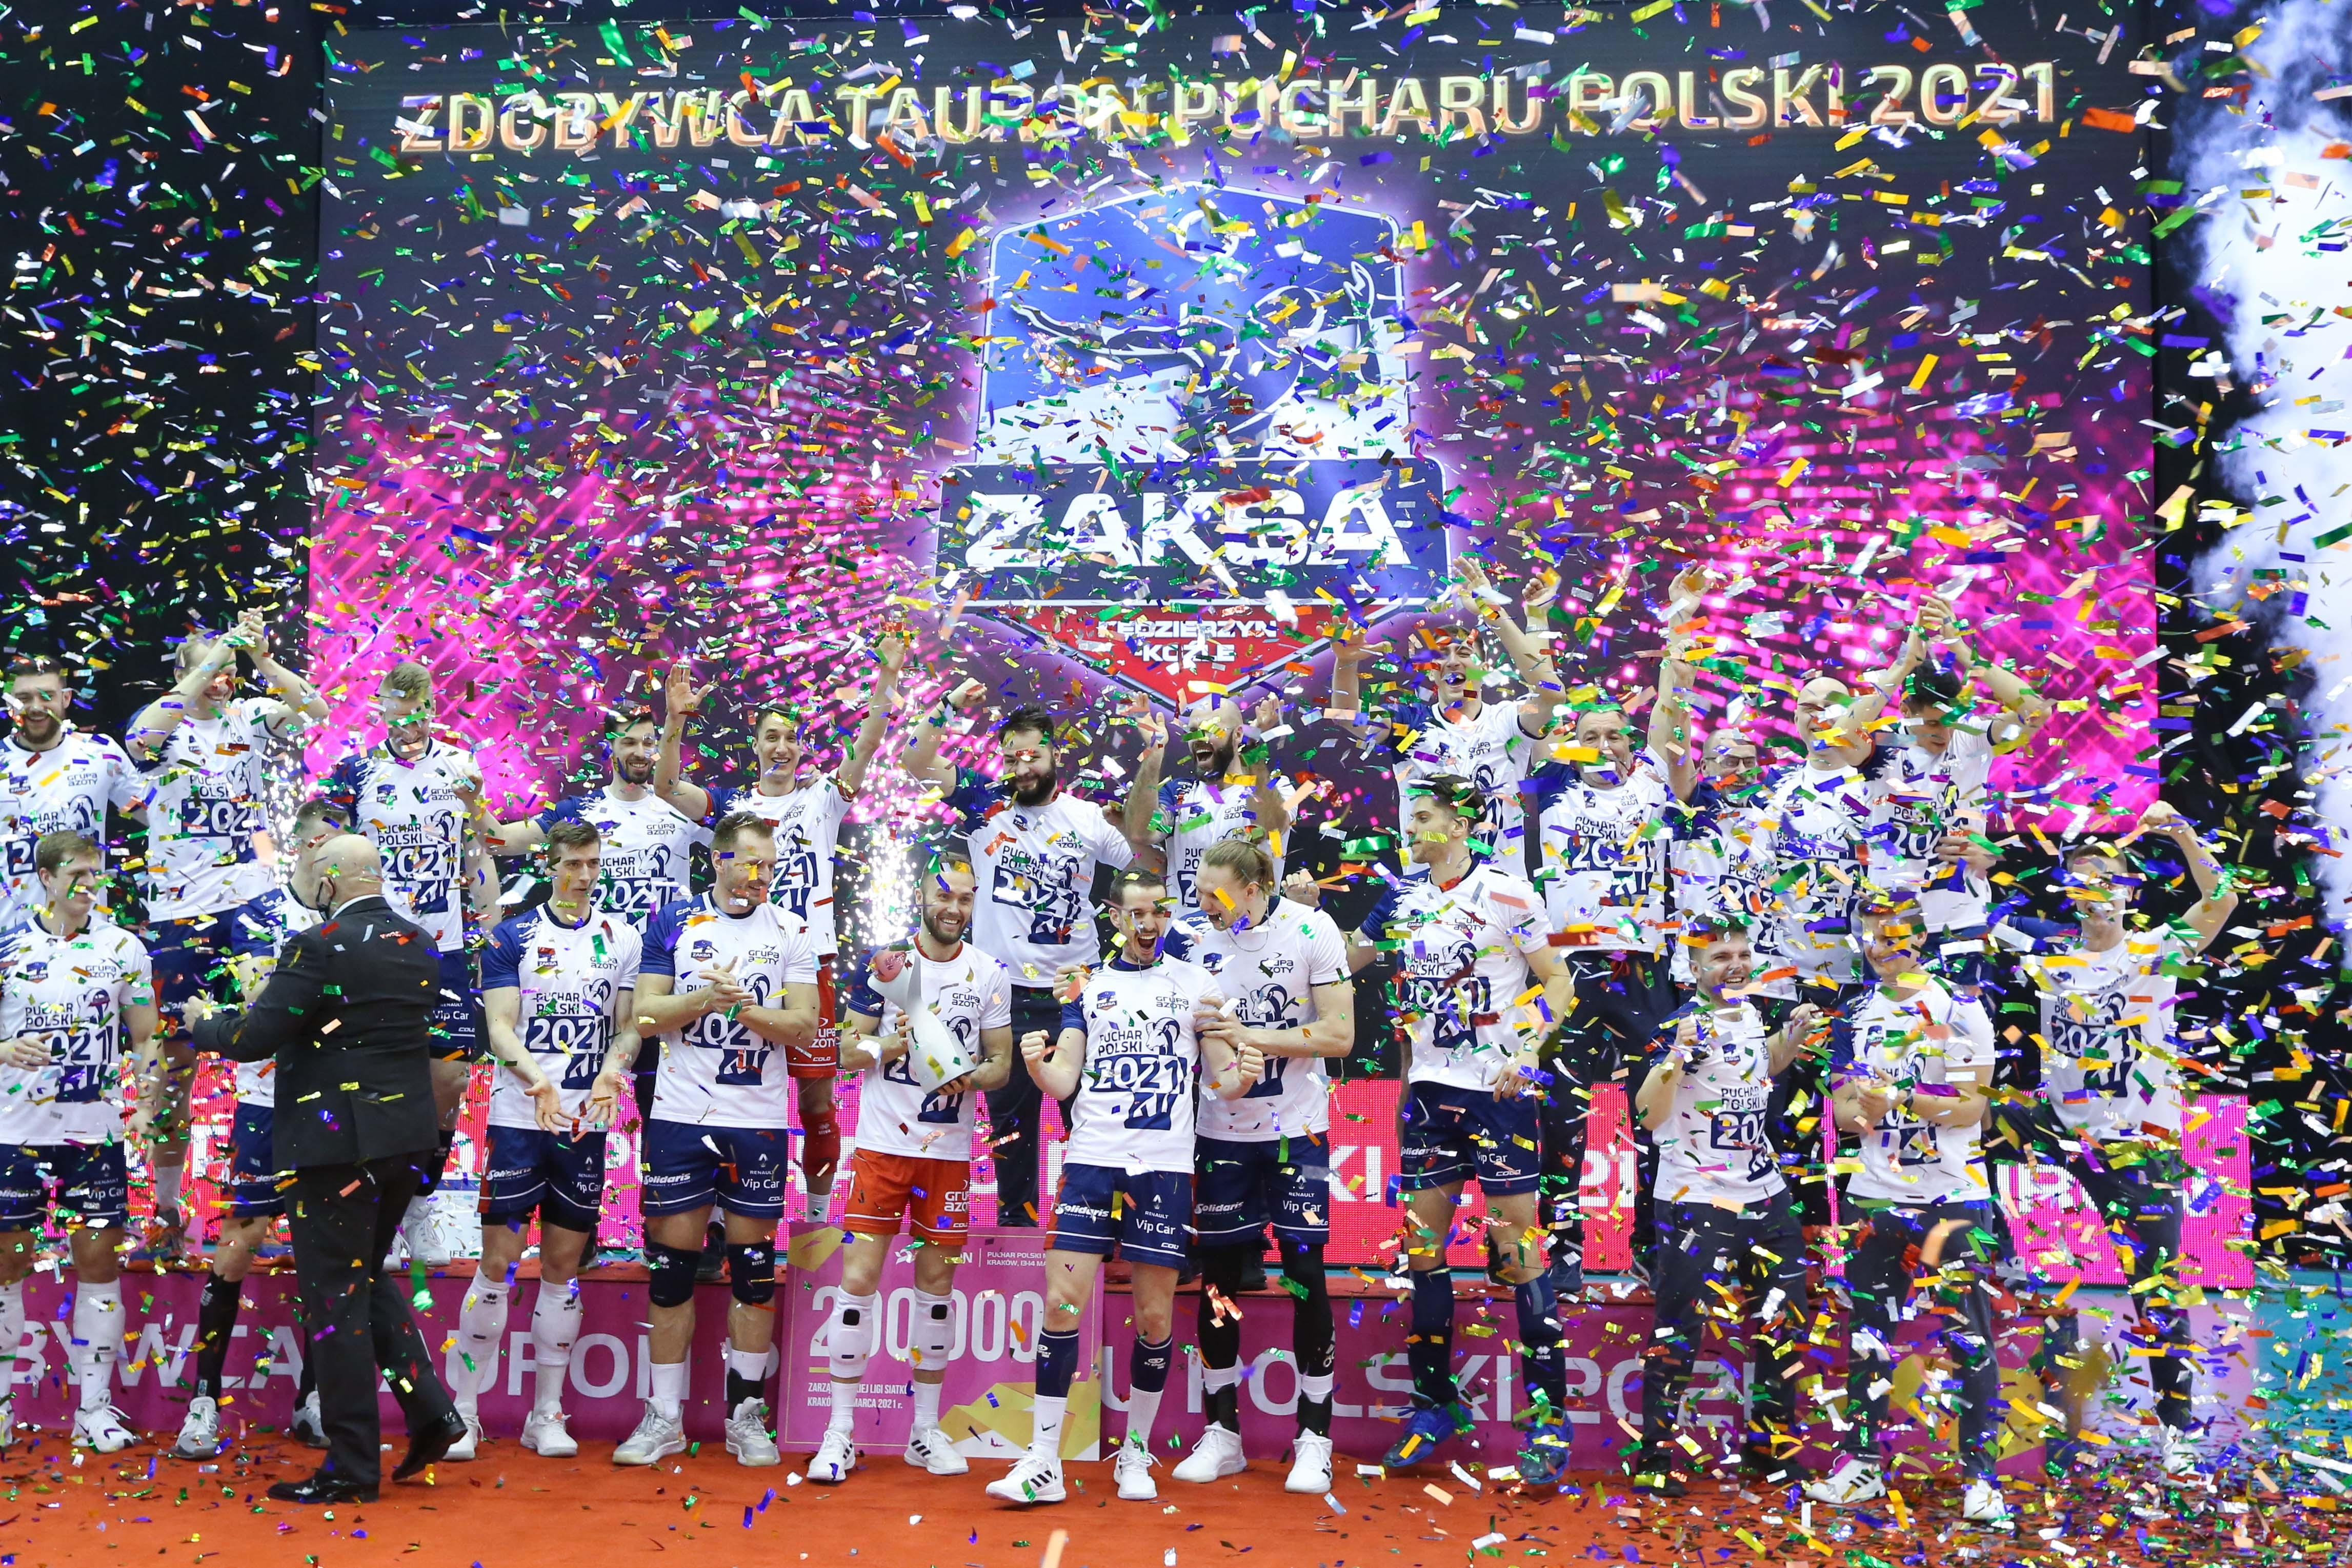 Tauron Puchar Polski 2021: Ceremonia dekoracji (galeria)